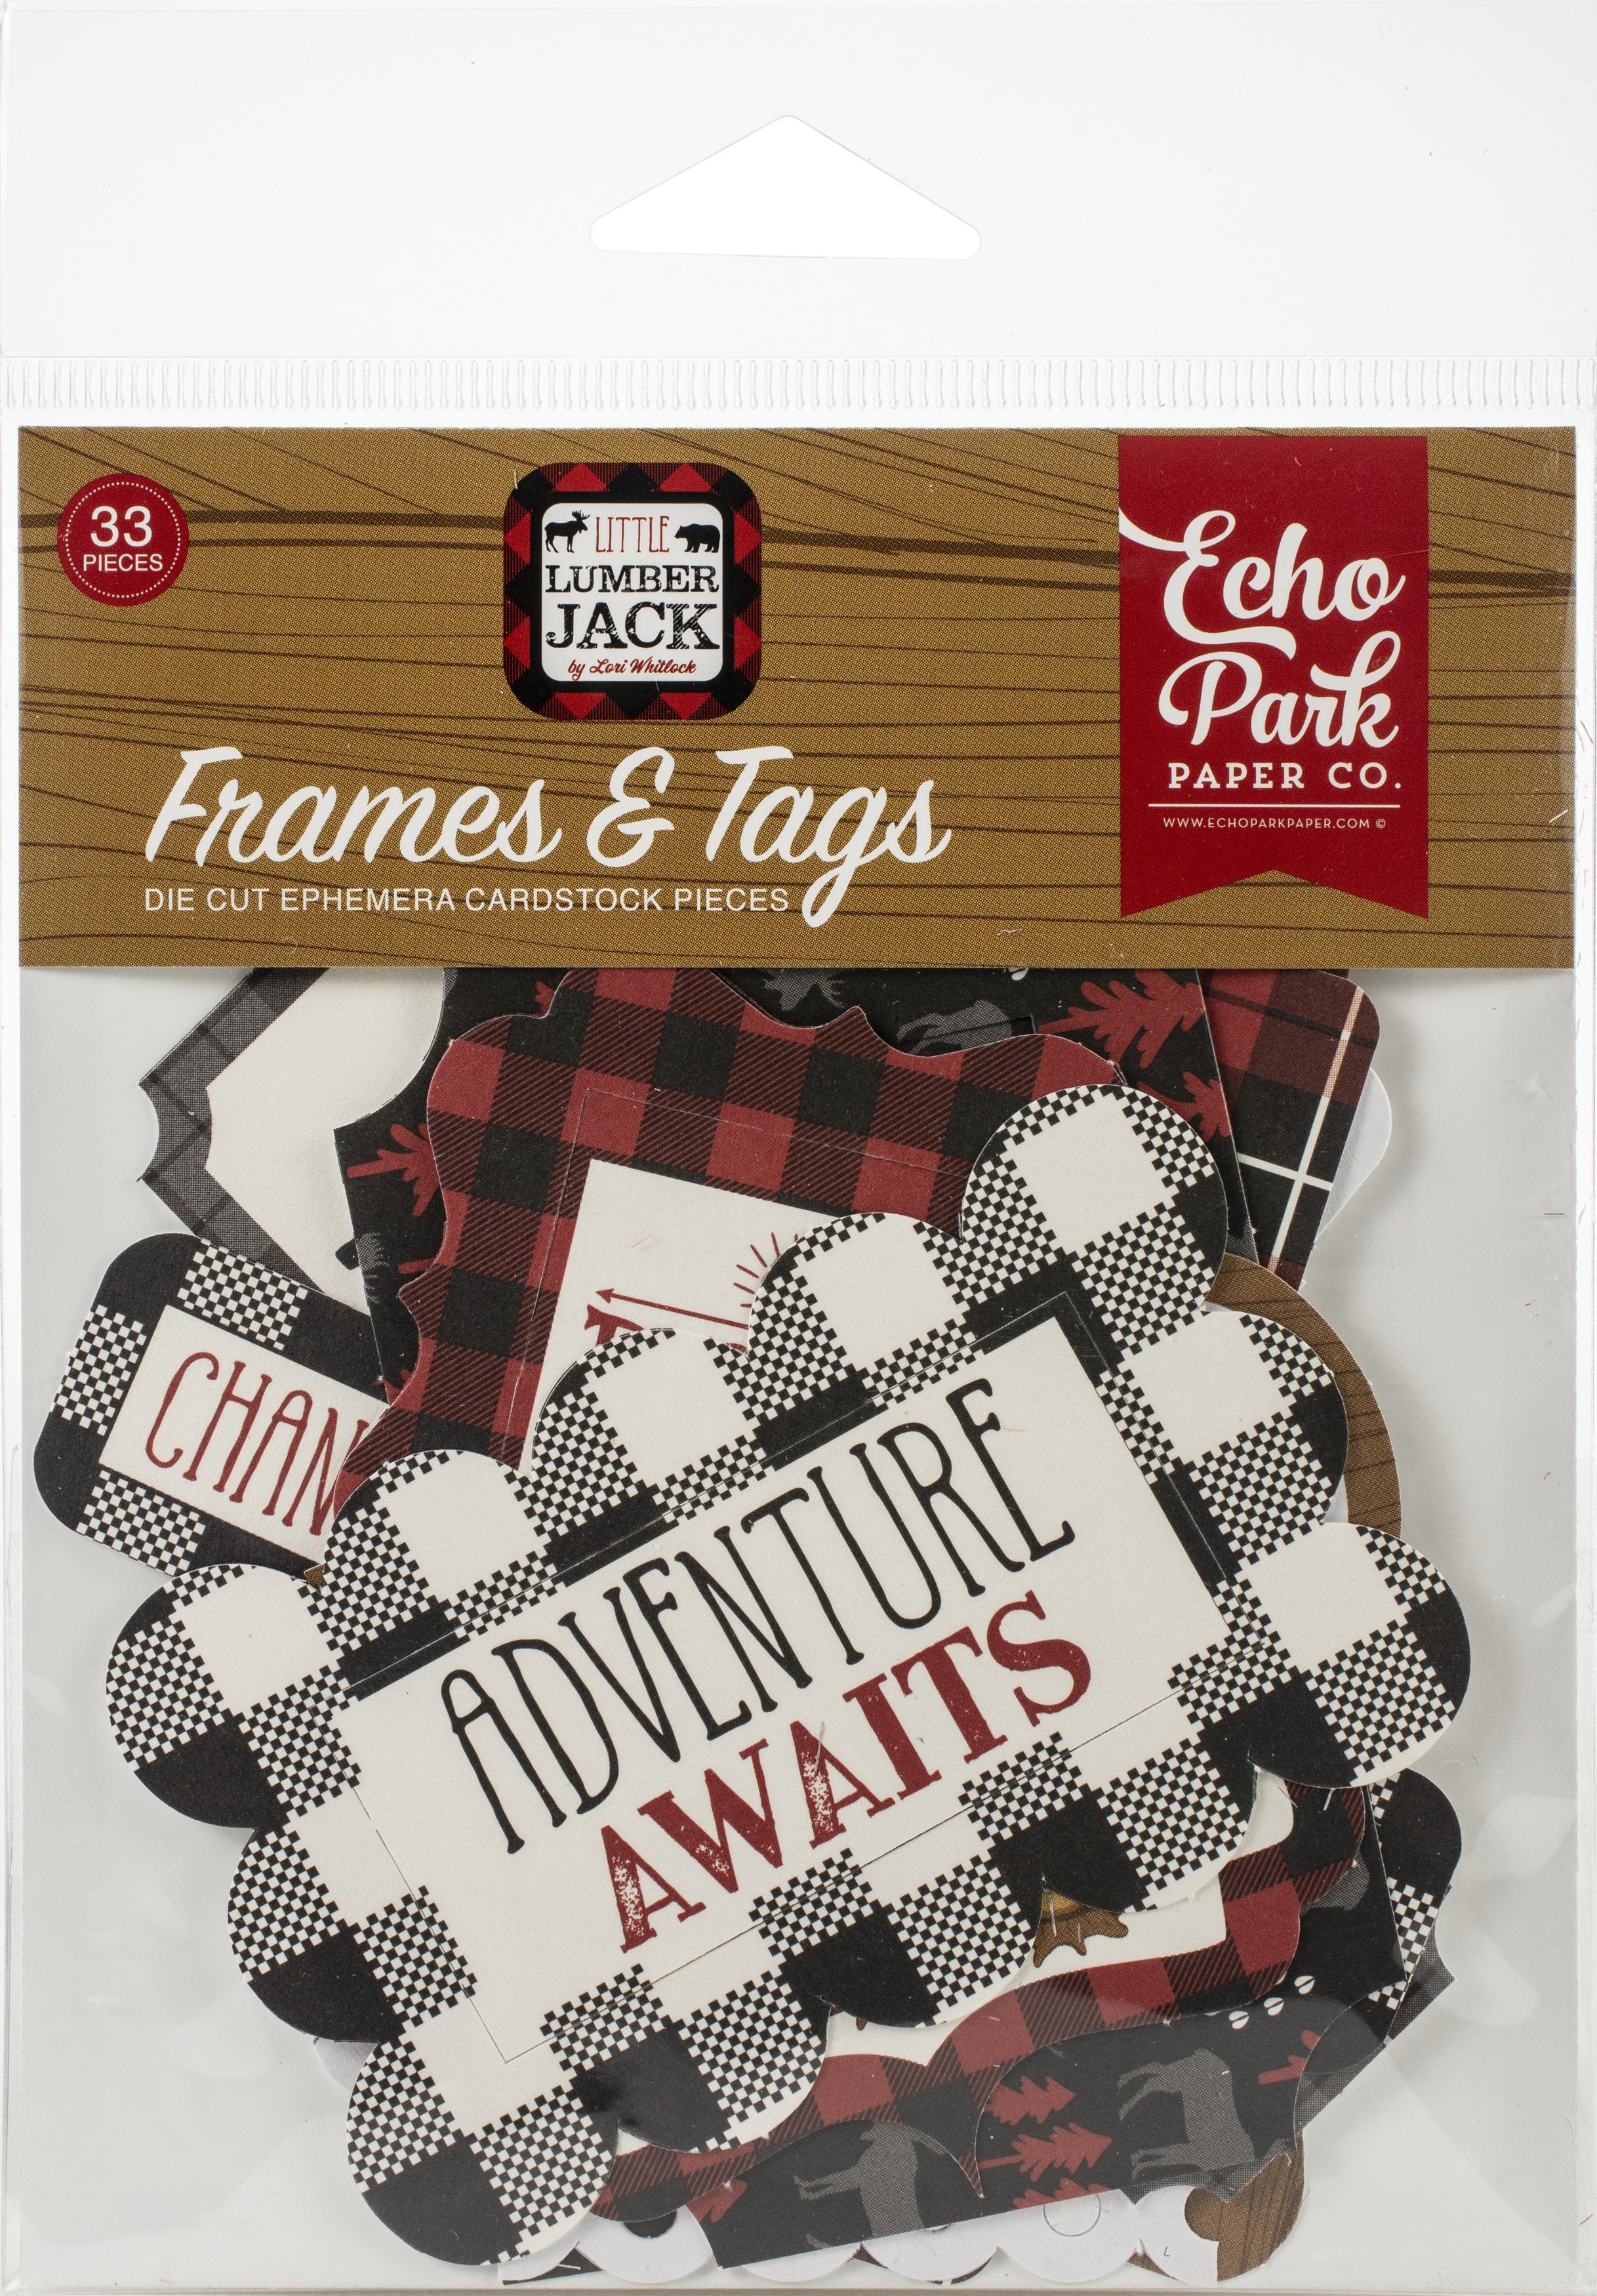 Echo Park Cardstock Ephemera 33/Pkg-Frames & Tags, Little Lumberjack